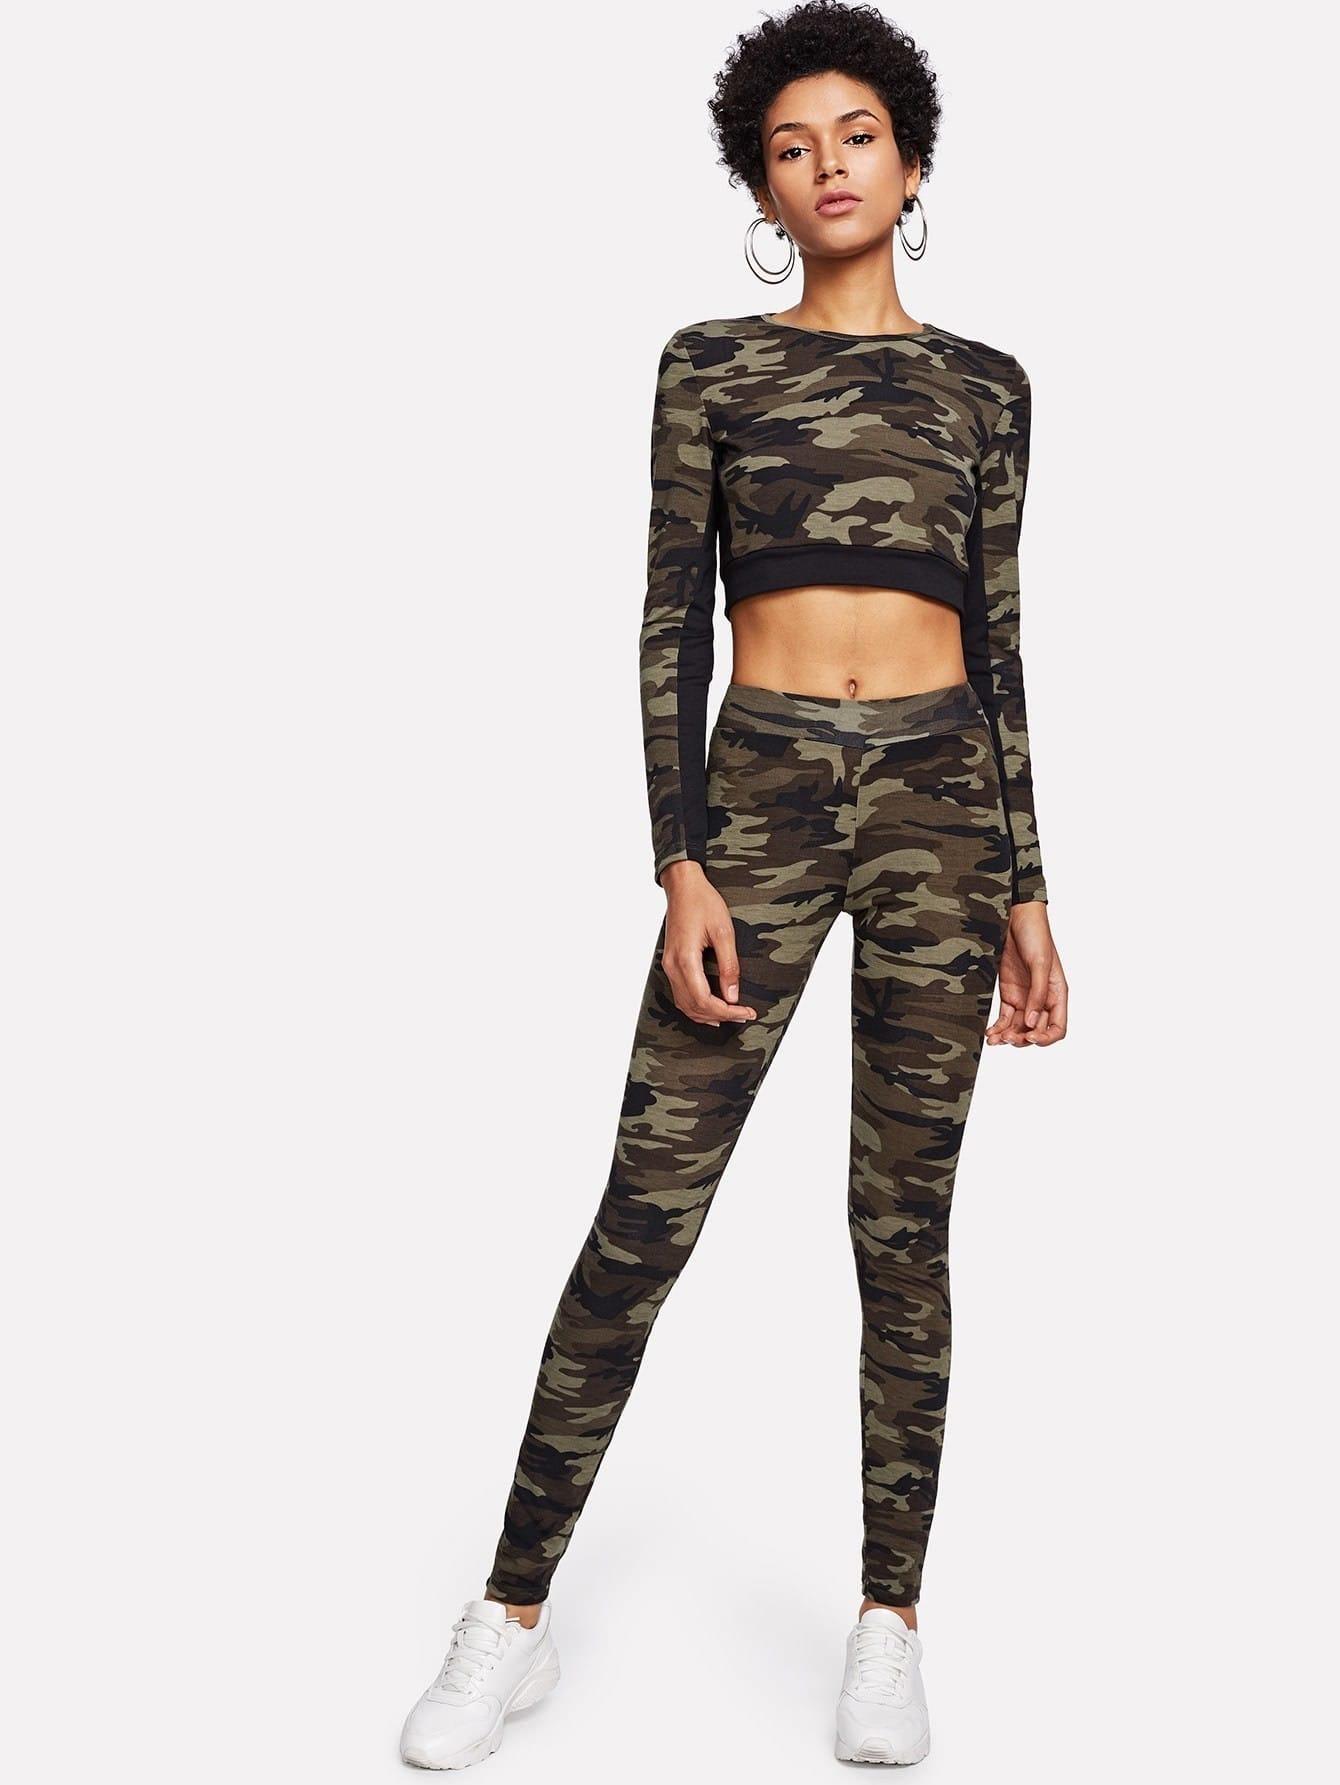 Camo Print Crop Top & Leggings Set camouflage print crop leggings